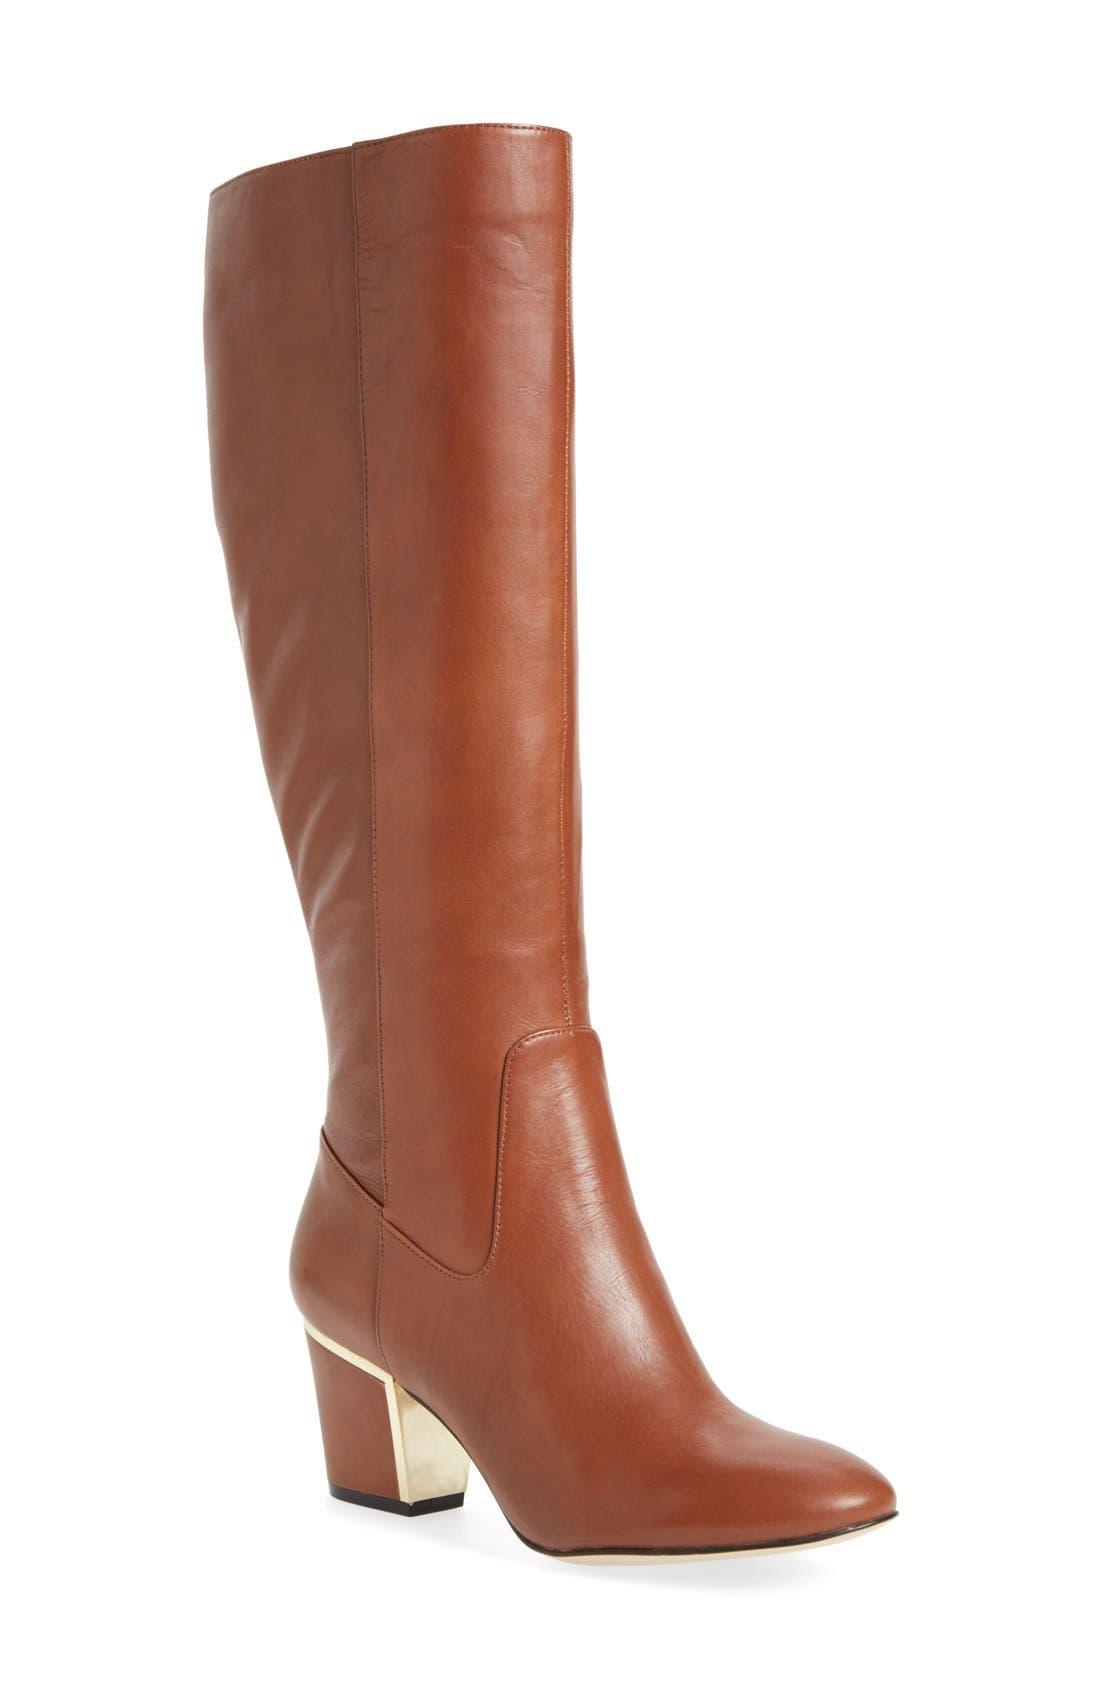 Alternate Image 1 Selected - Calvin Klein'Keana' Knee High Boot (Women)